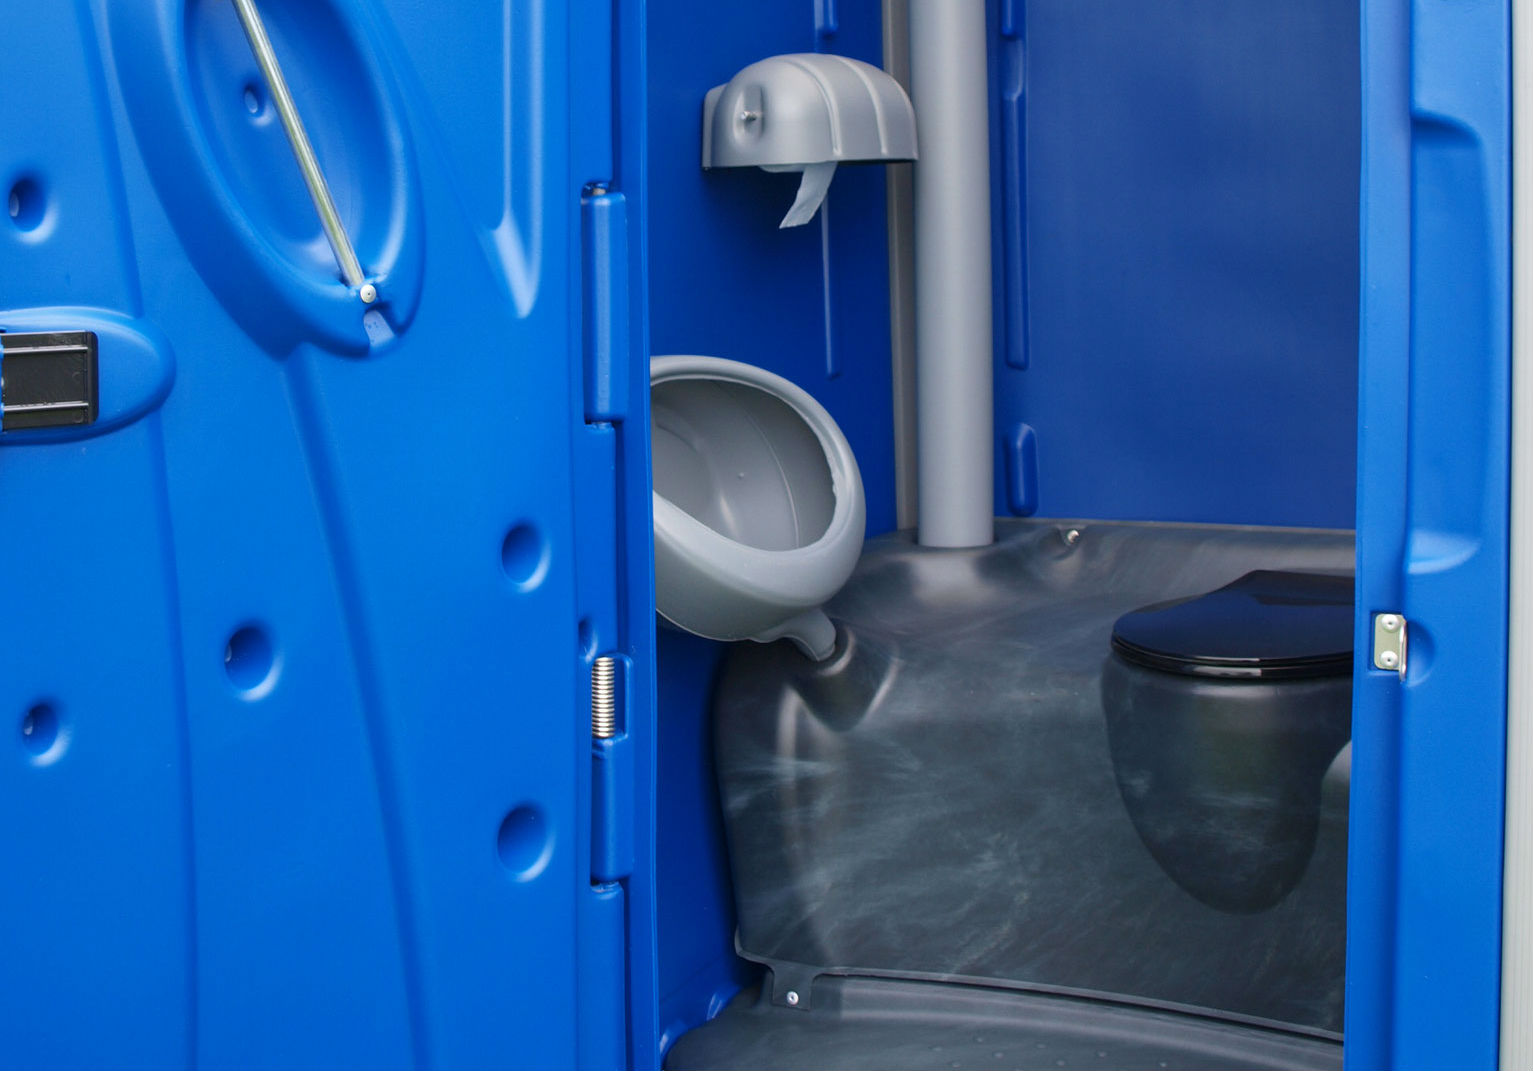 Tiefspül wc tiefspül toilette kaufen calmwaters